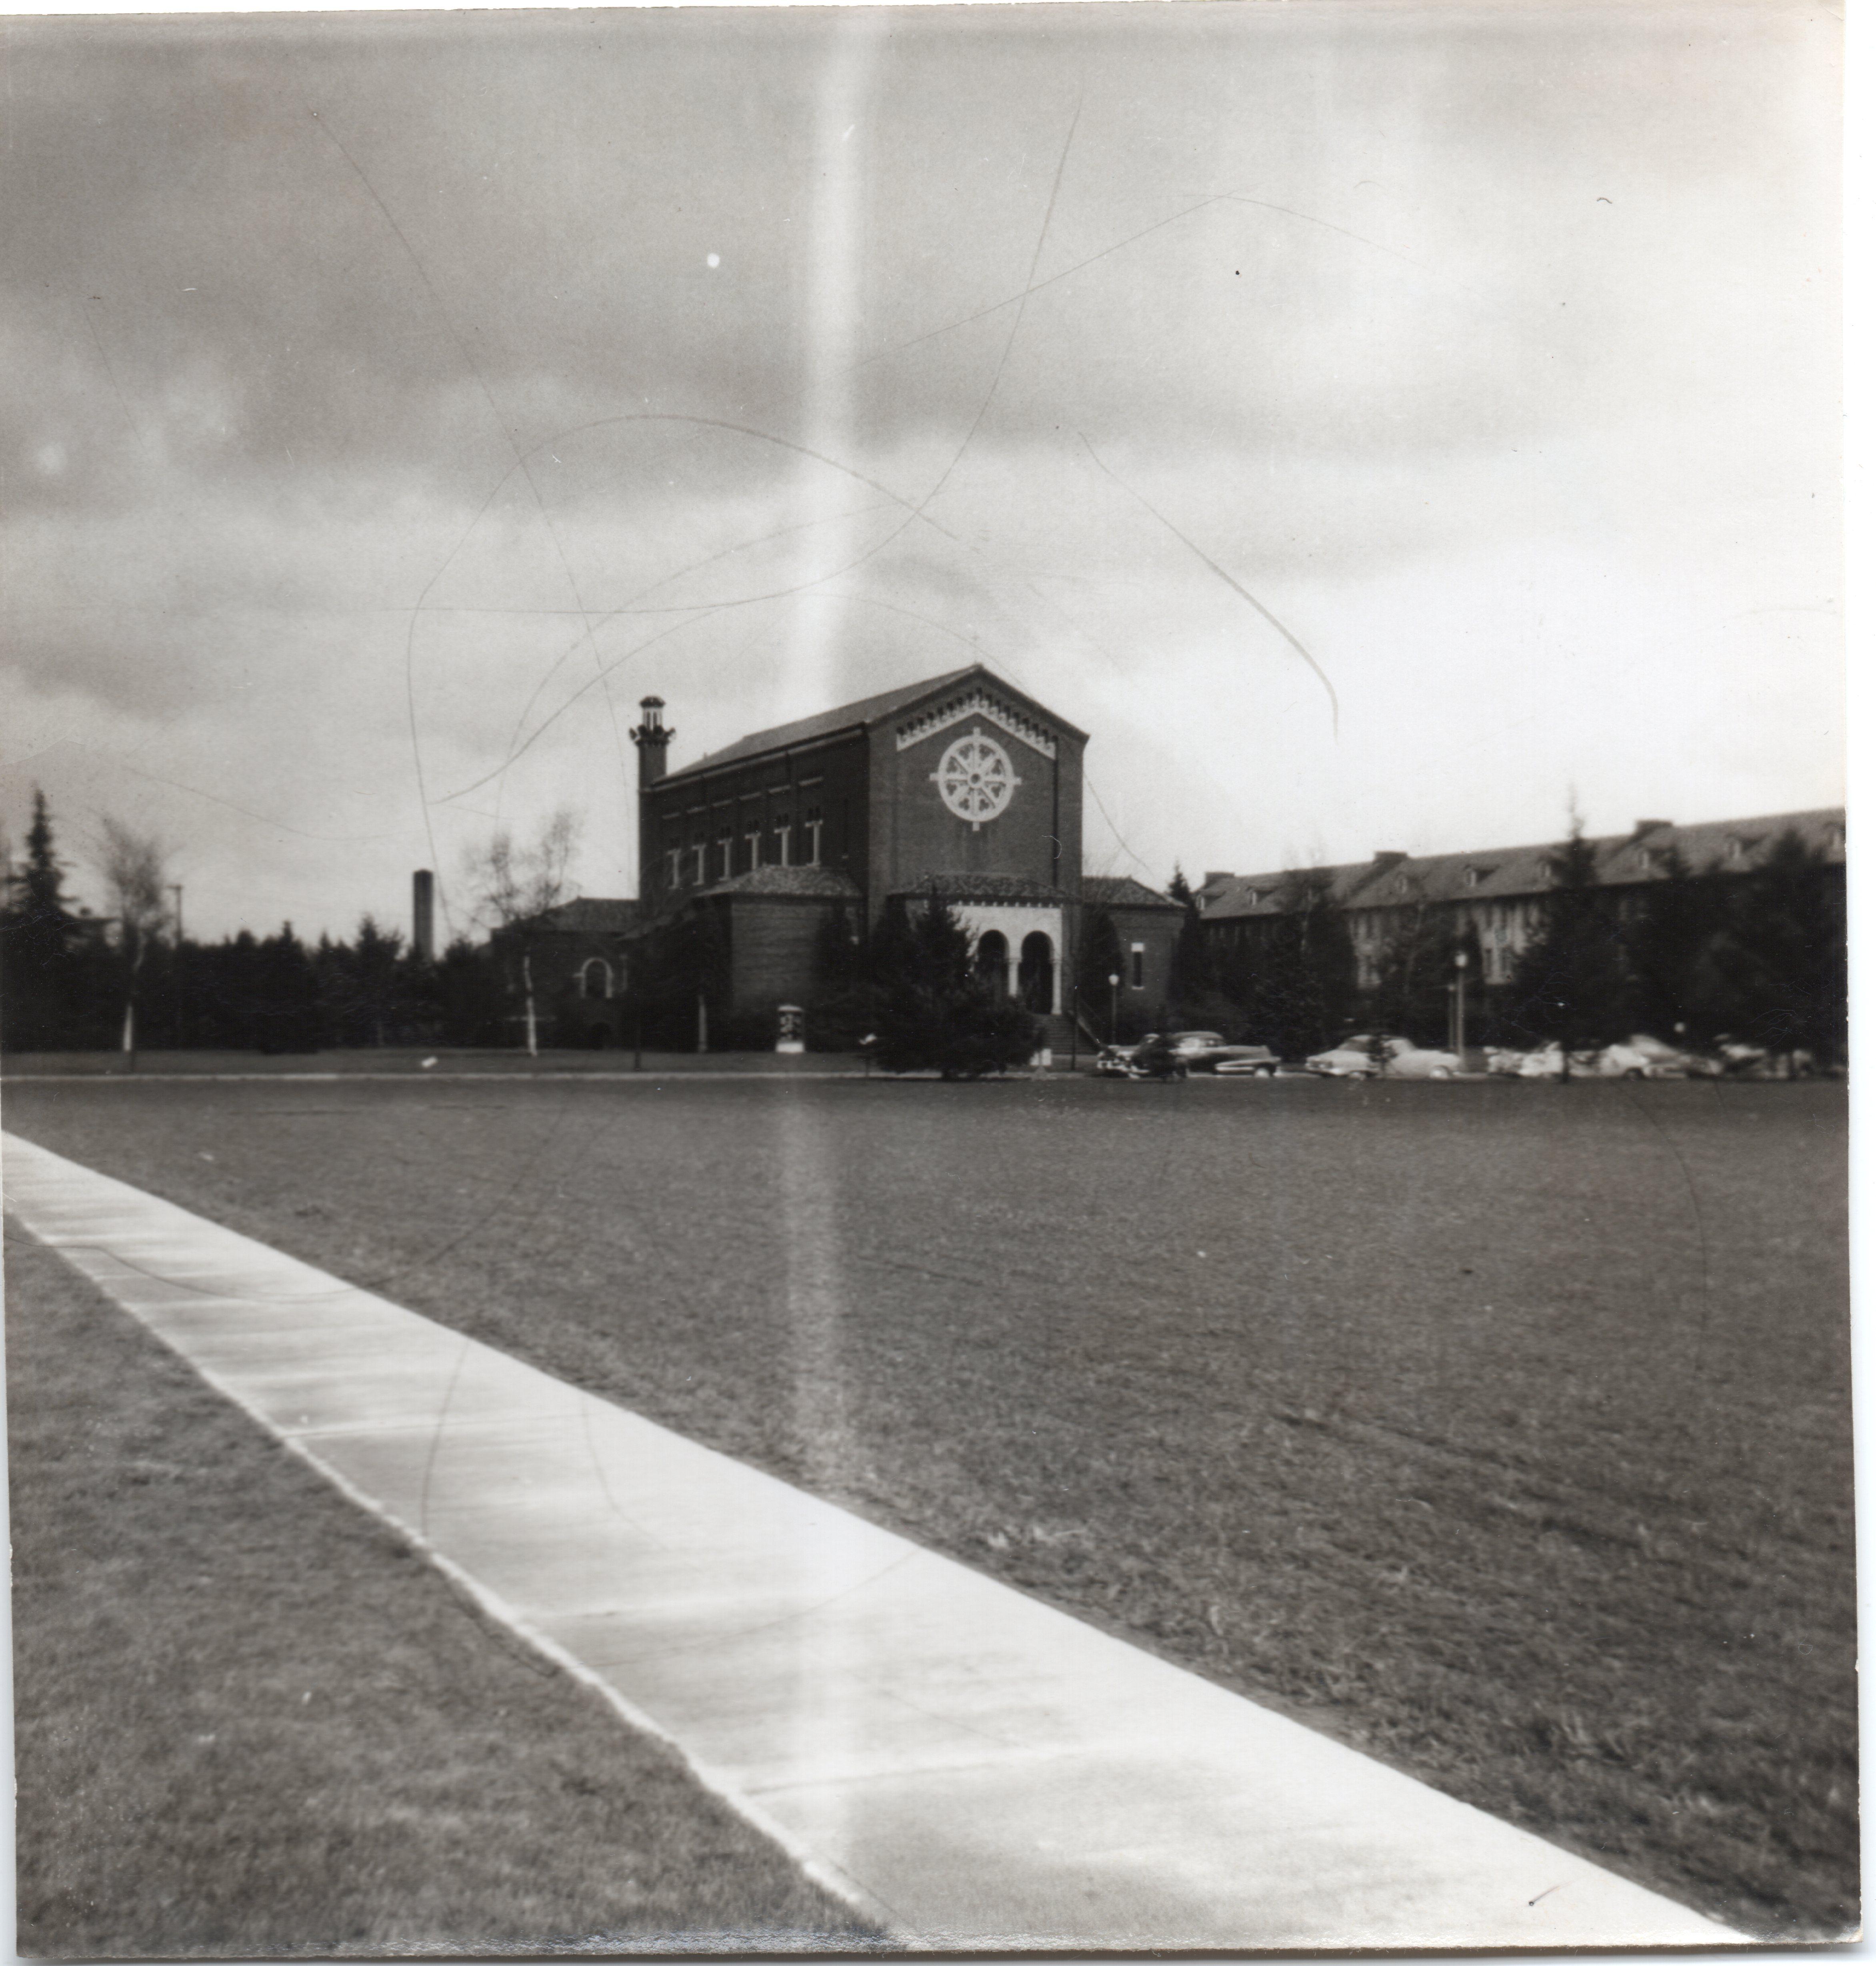 Ft Lewis Main Post Chapel